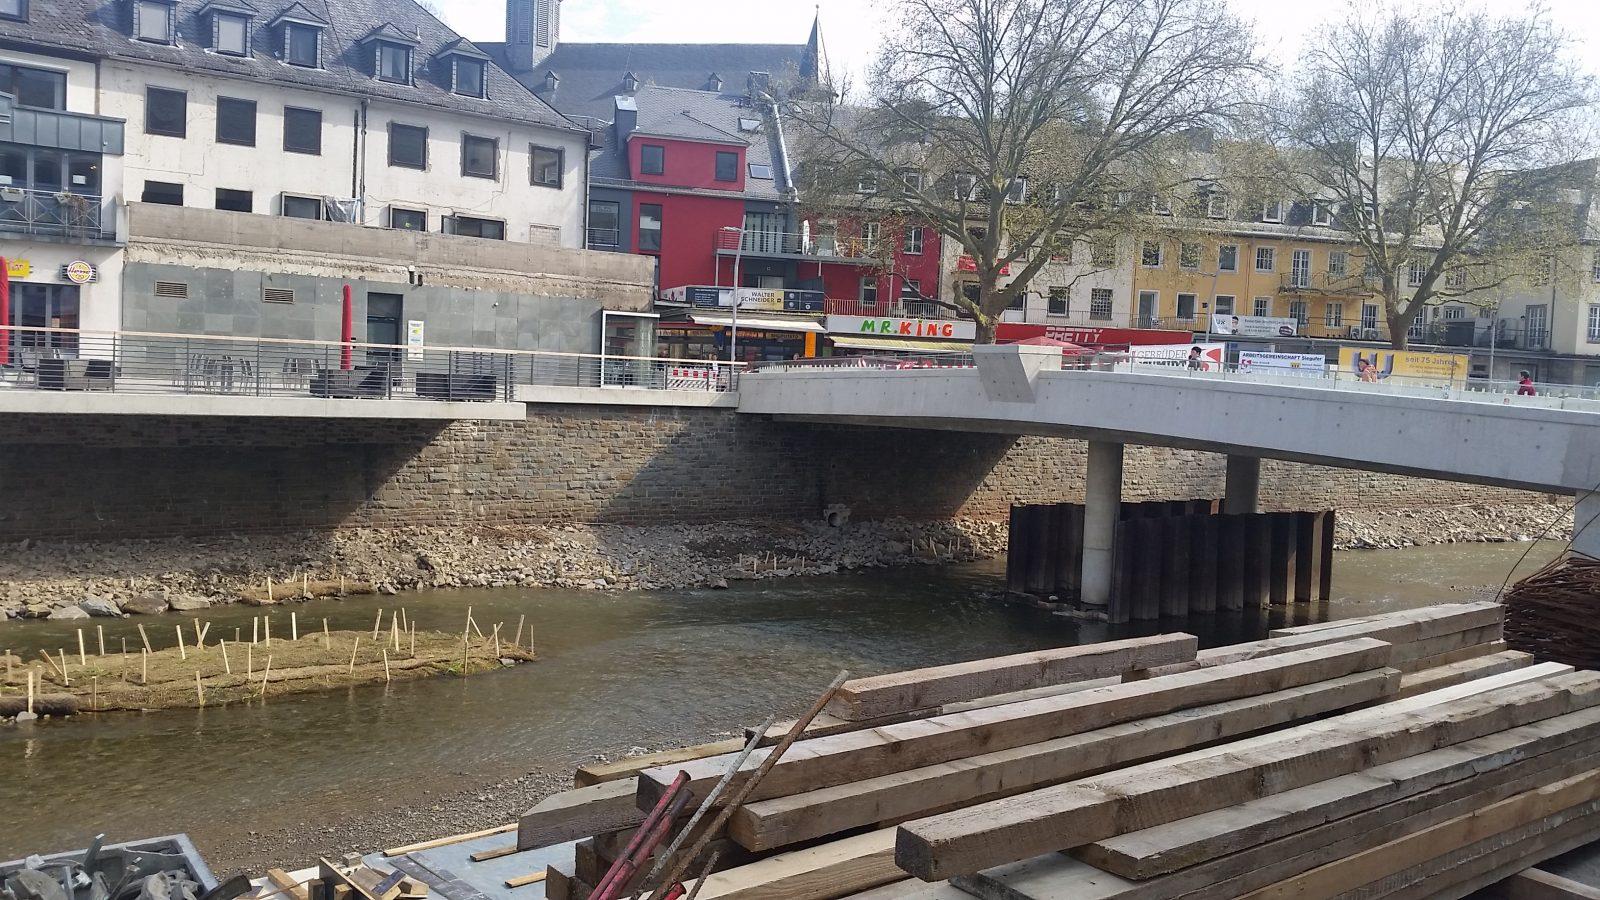 umbau-siegplatte-28_04_2015-siegen-fluss-boulevard-stadtentwicklung-sieg_creative-commons_5